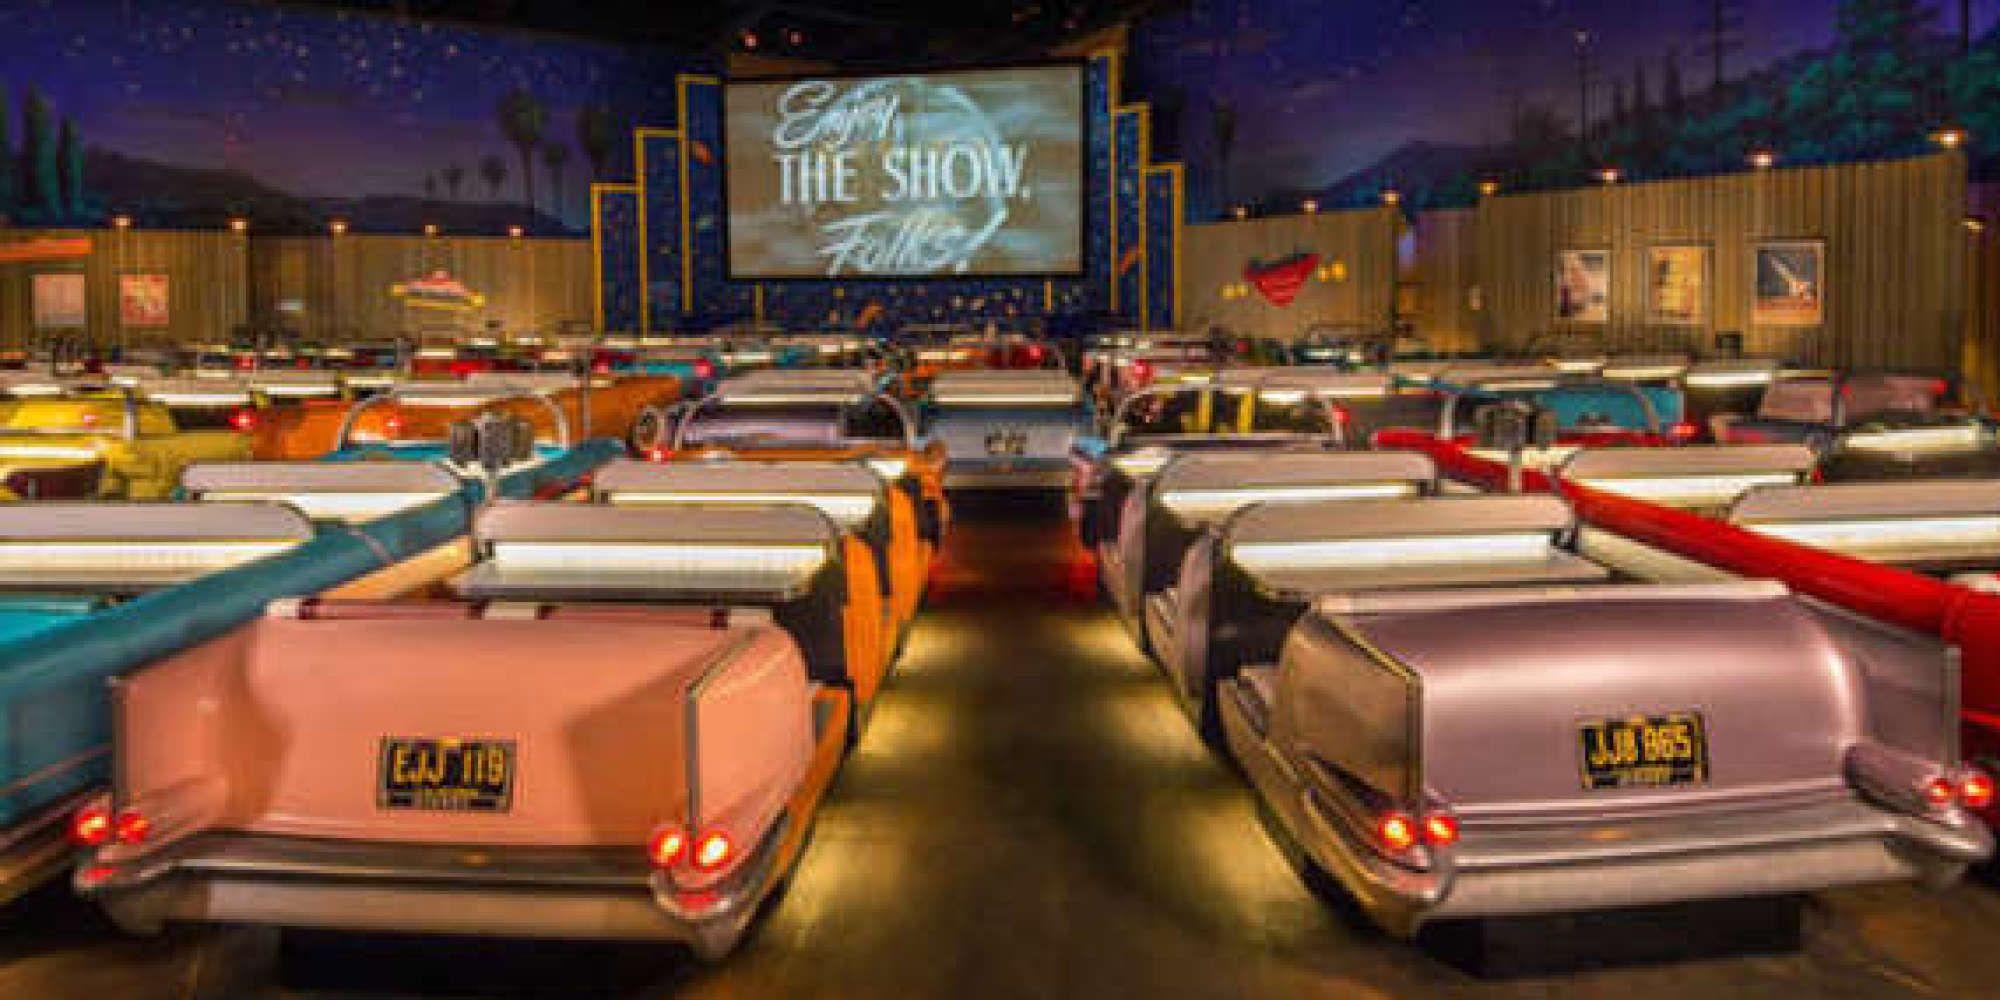 Disney world has the retro drivein theater of the future